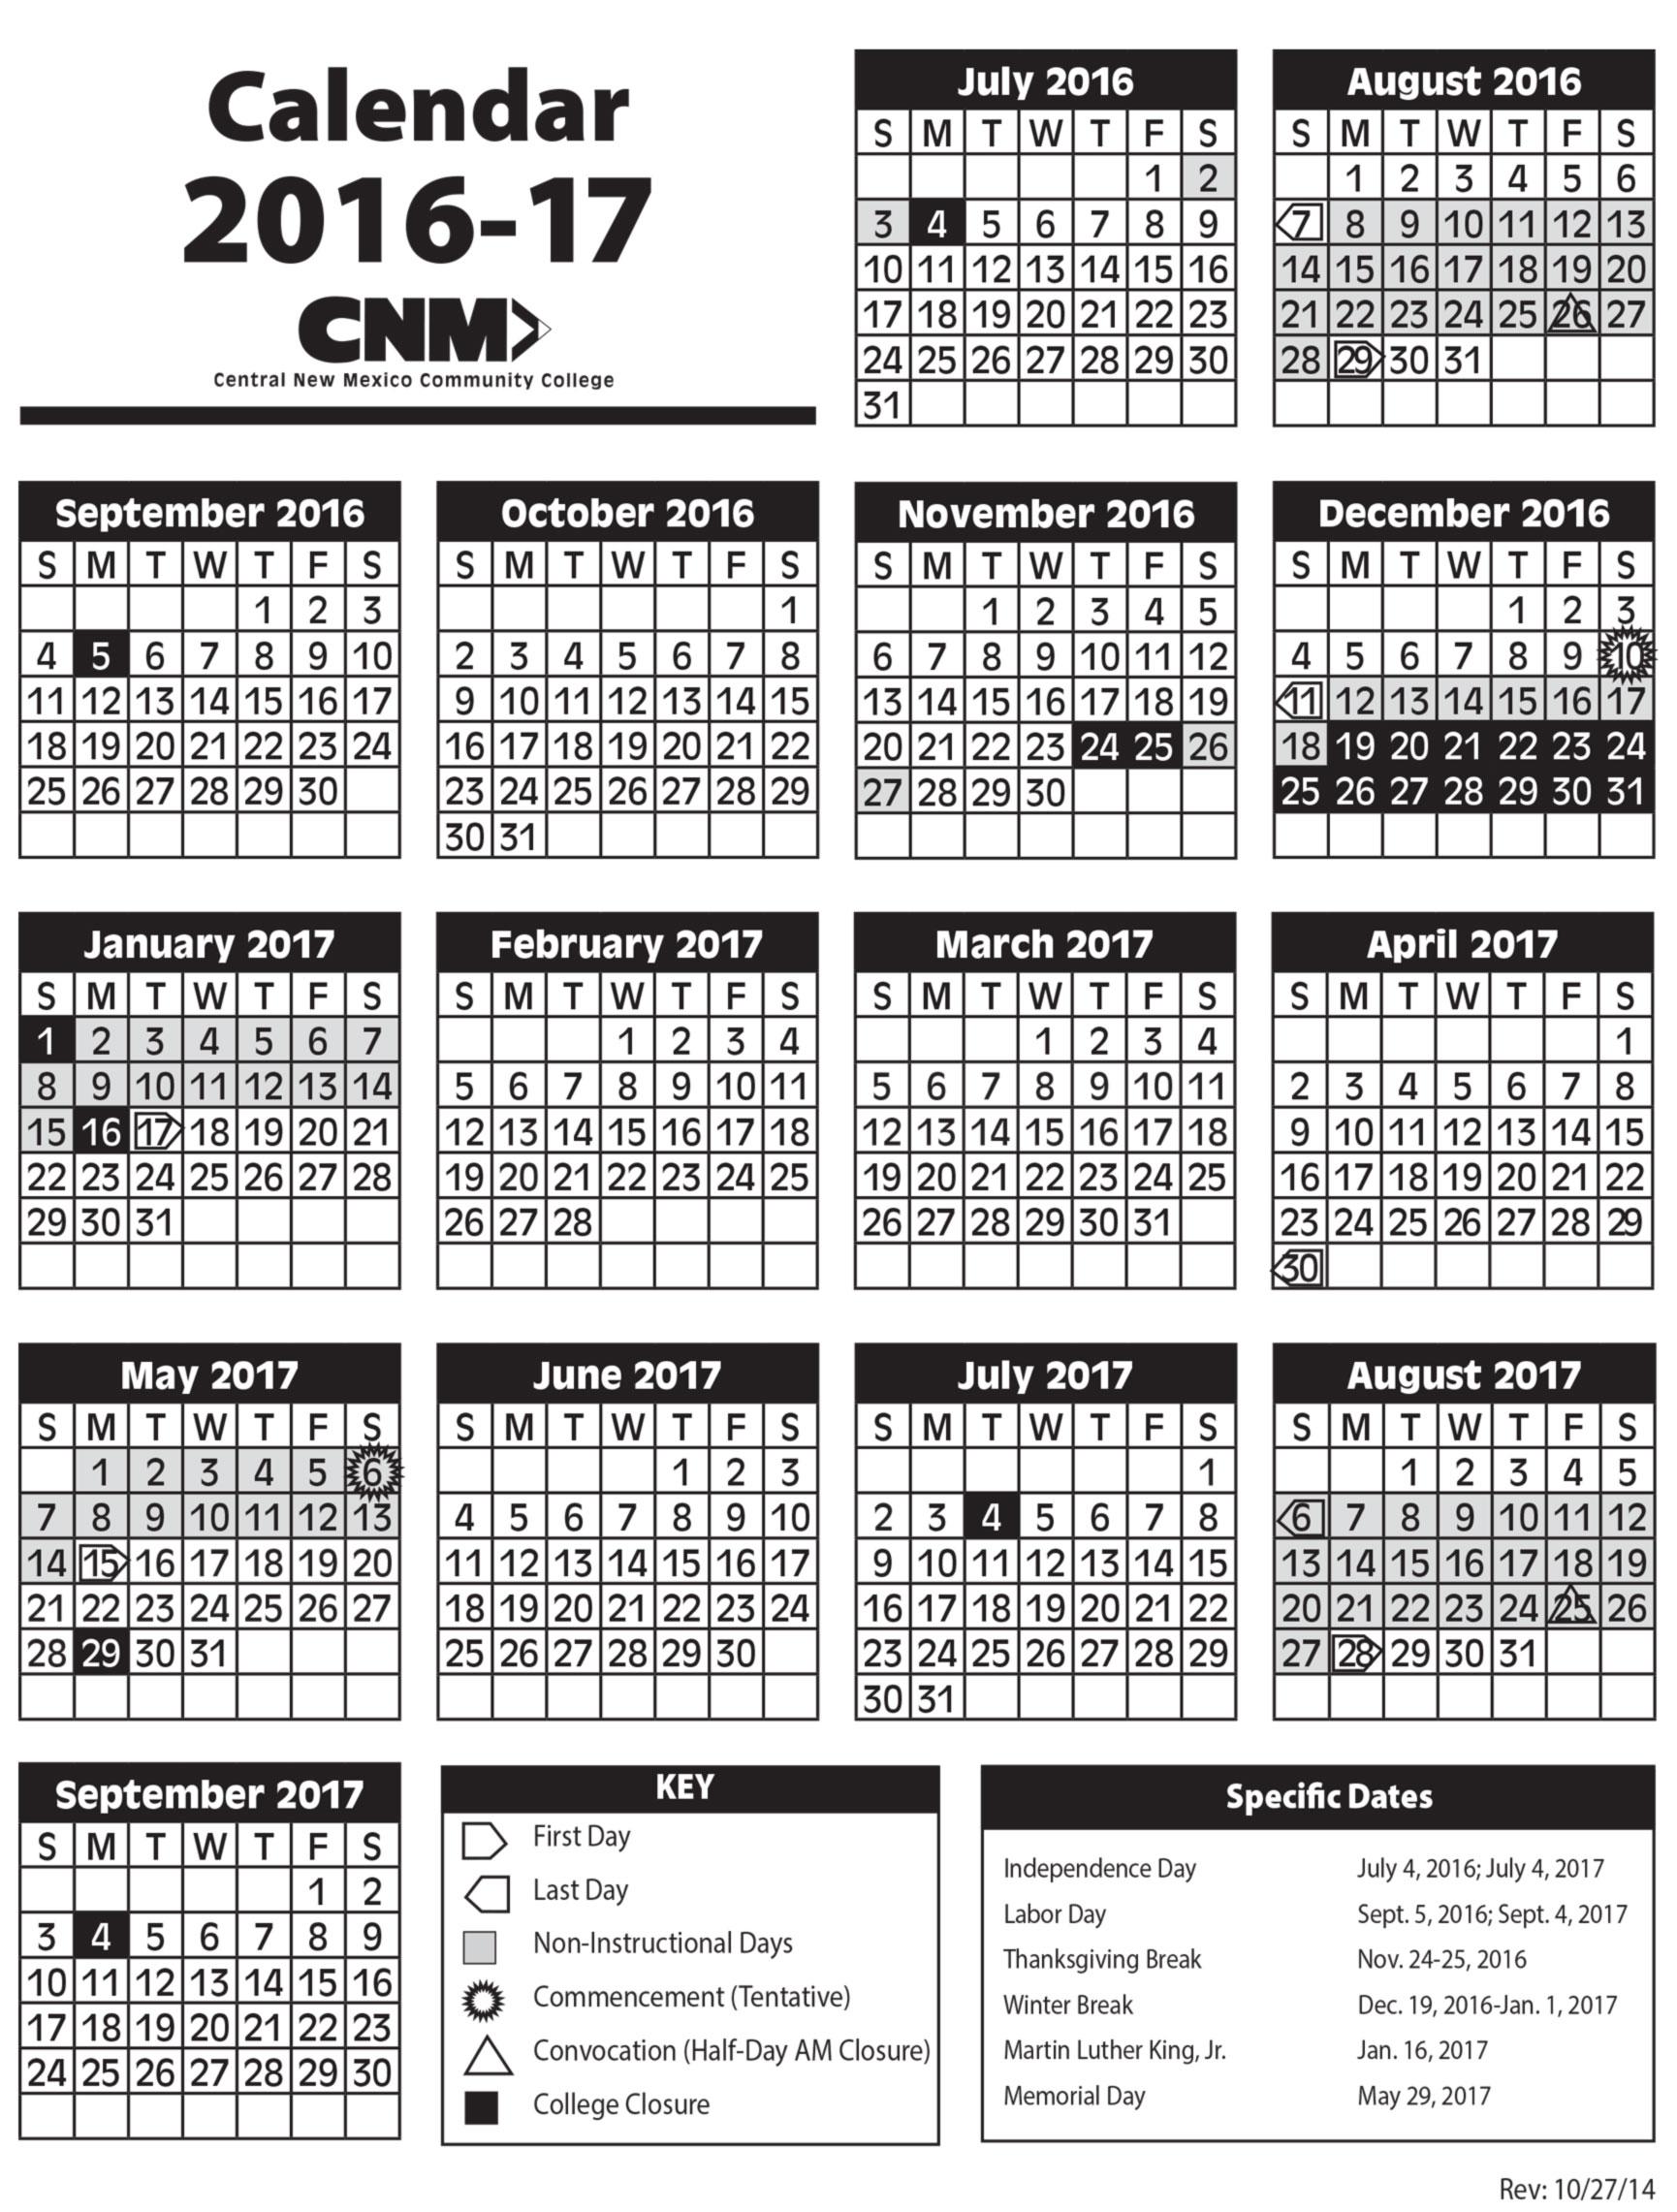 2016-2017 Academic Calendar image